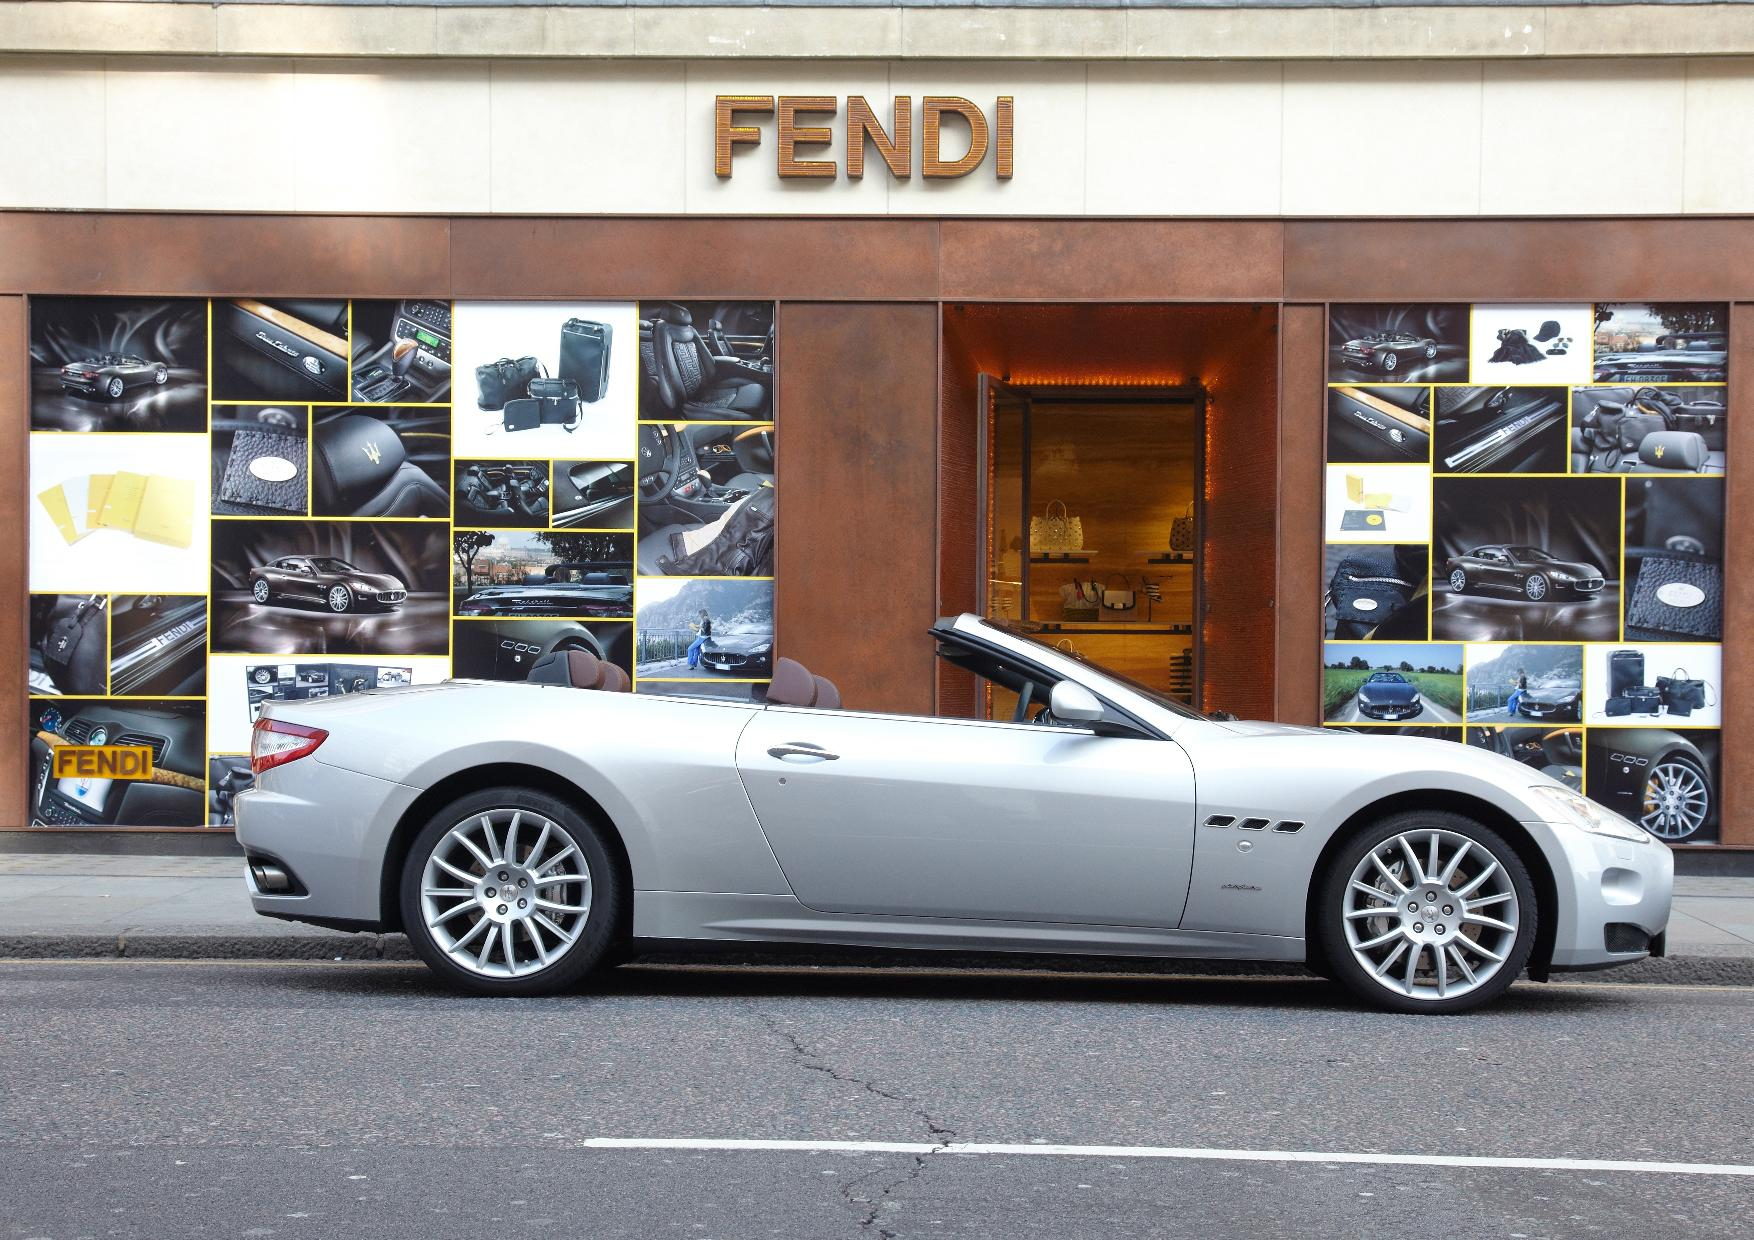 Fendi Maserati Travel Kit Launched